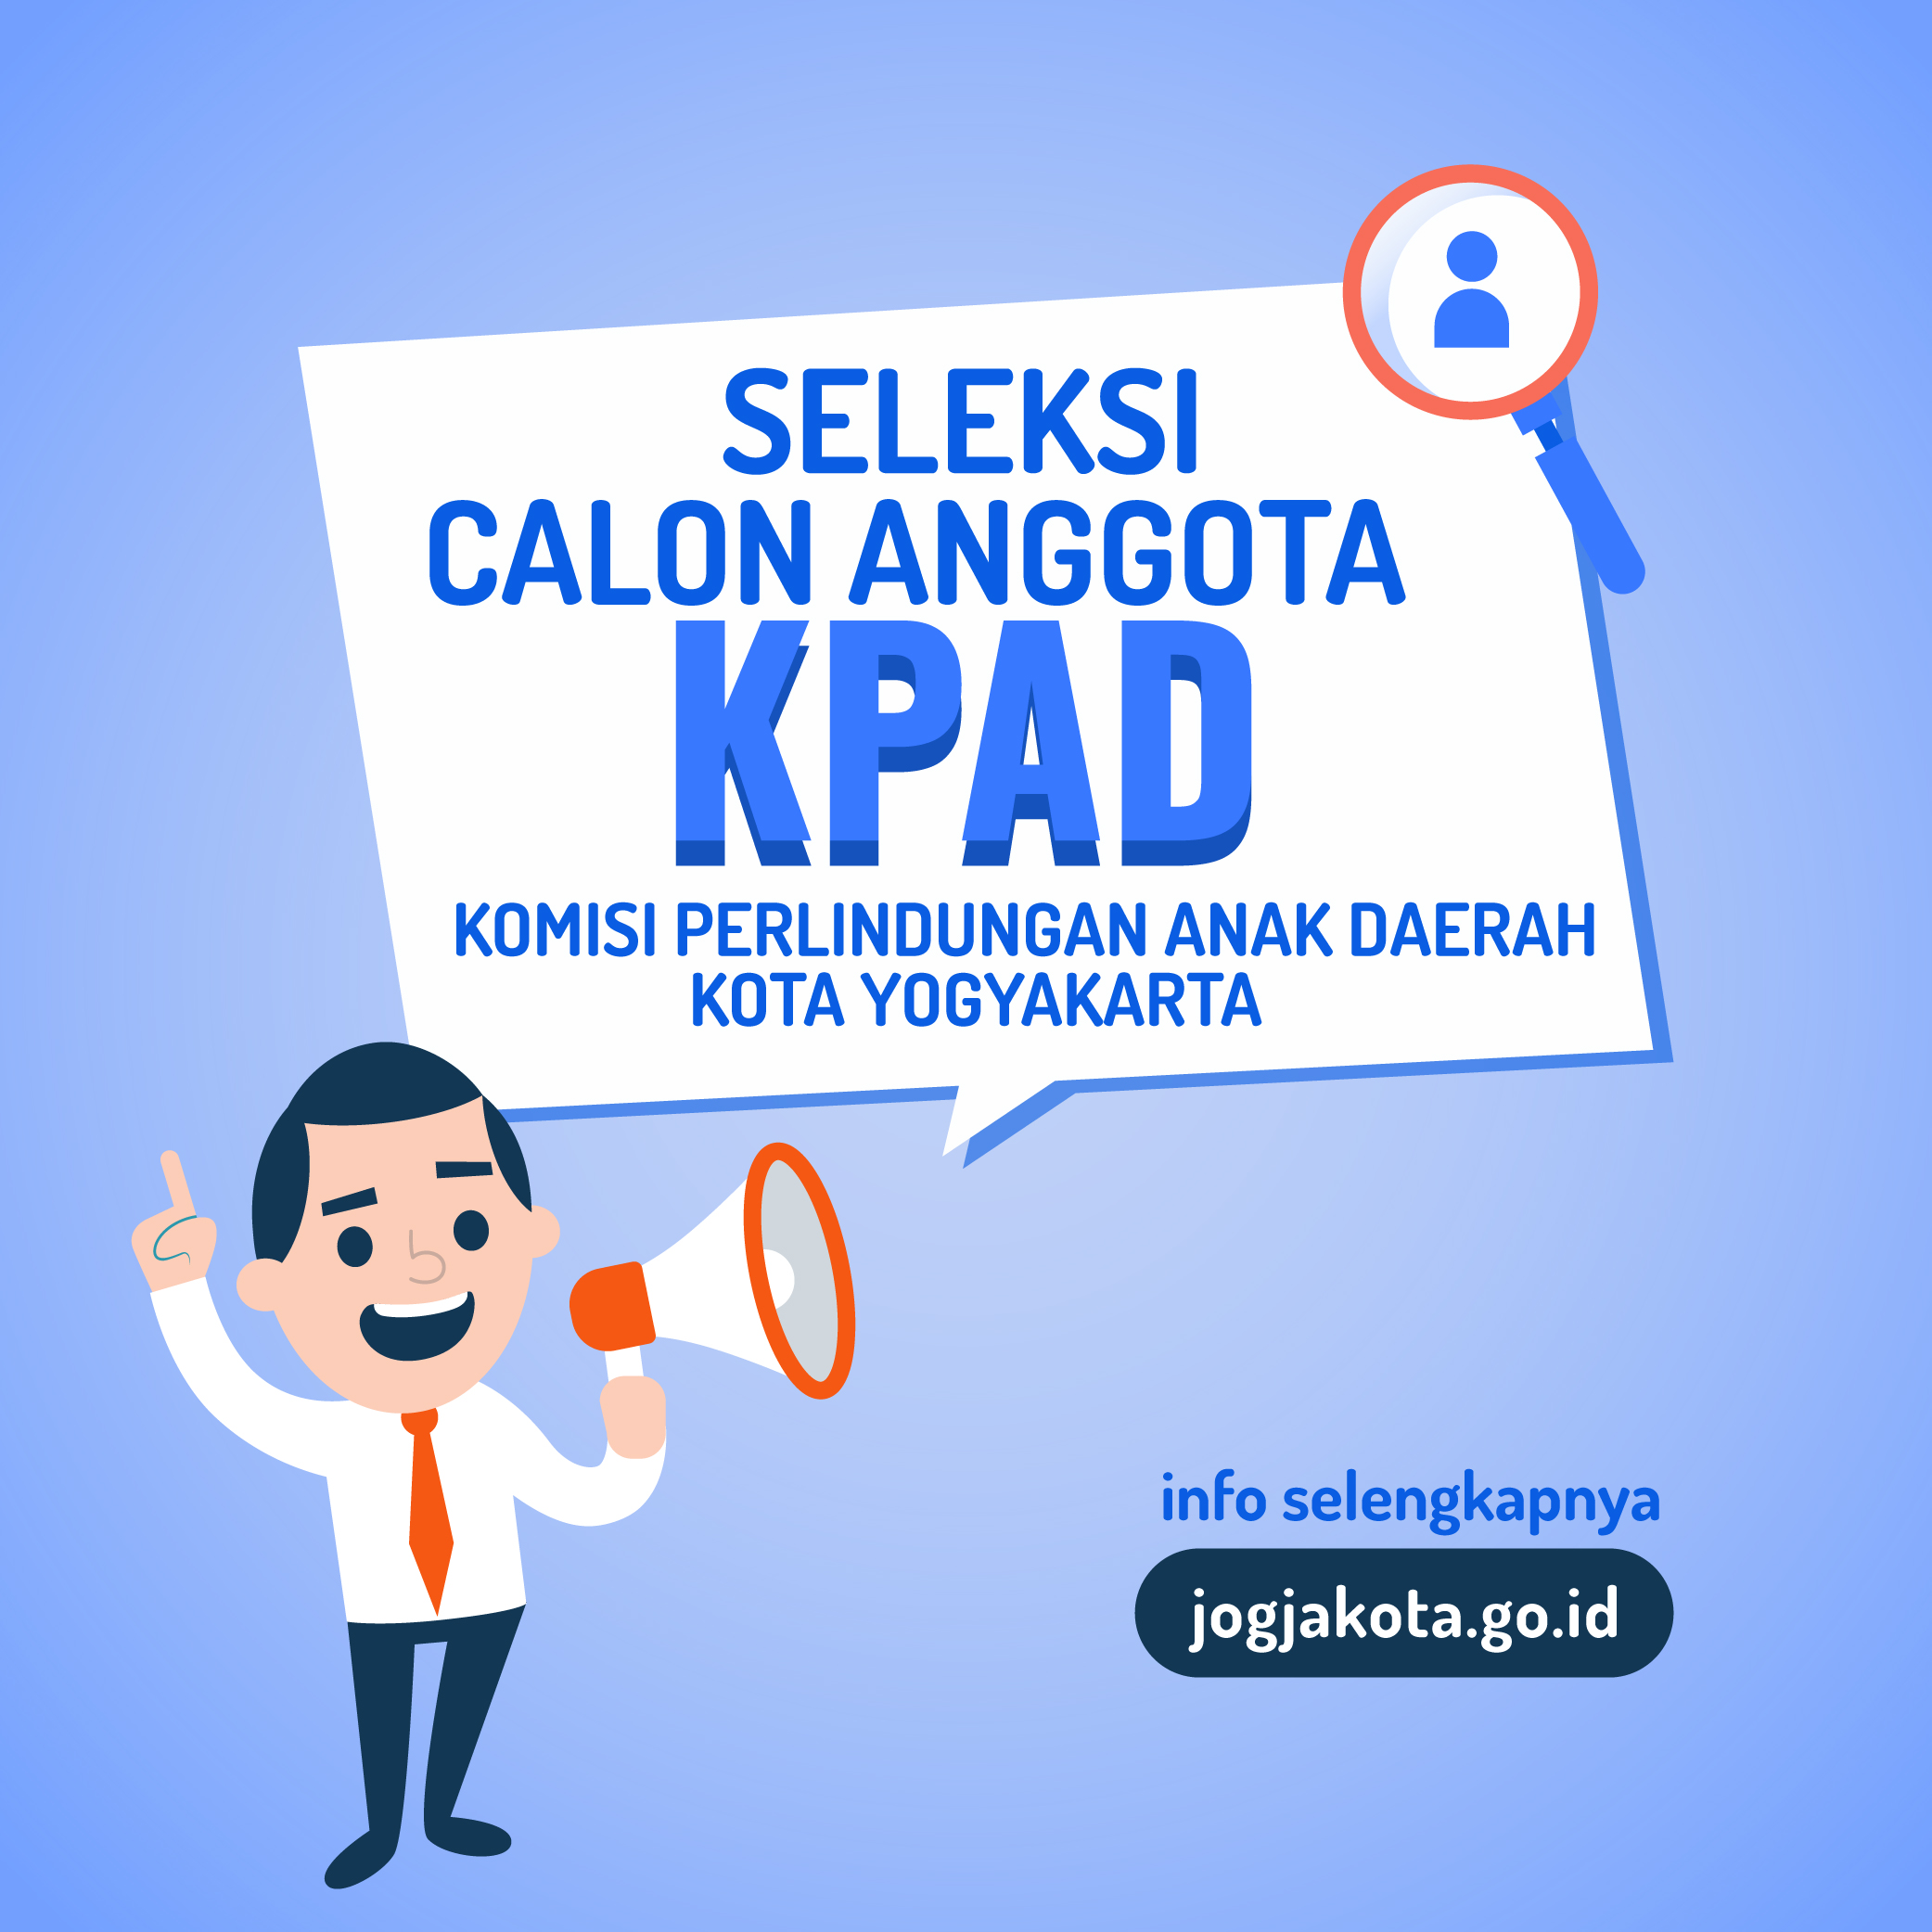 Seleksi Calon Anggota Komisi Perlindungan Anak Daerah (KPAD) Kota Yogyakarta